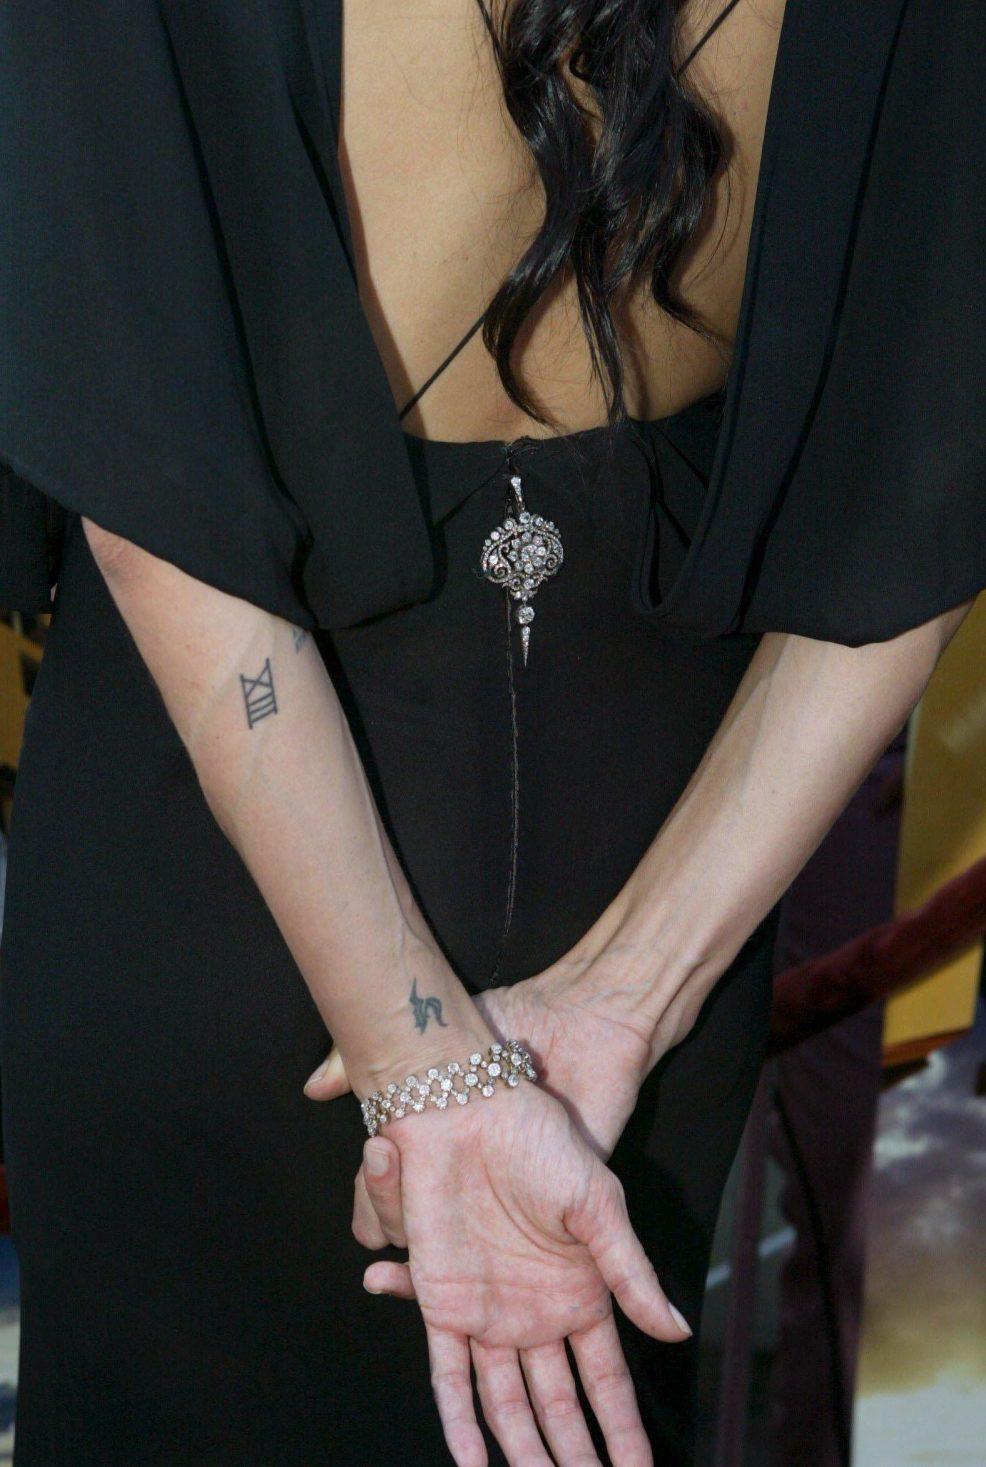 Angelina Jolie Tattoos From Billy Bob To Brad Pitts Spiritually